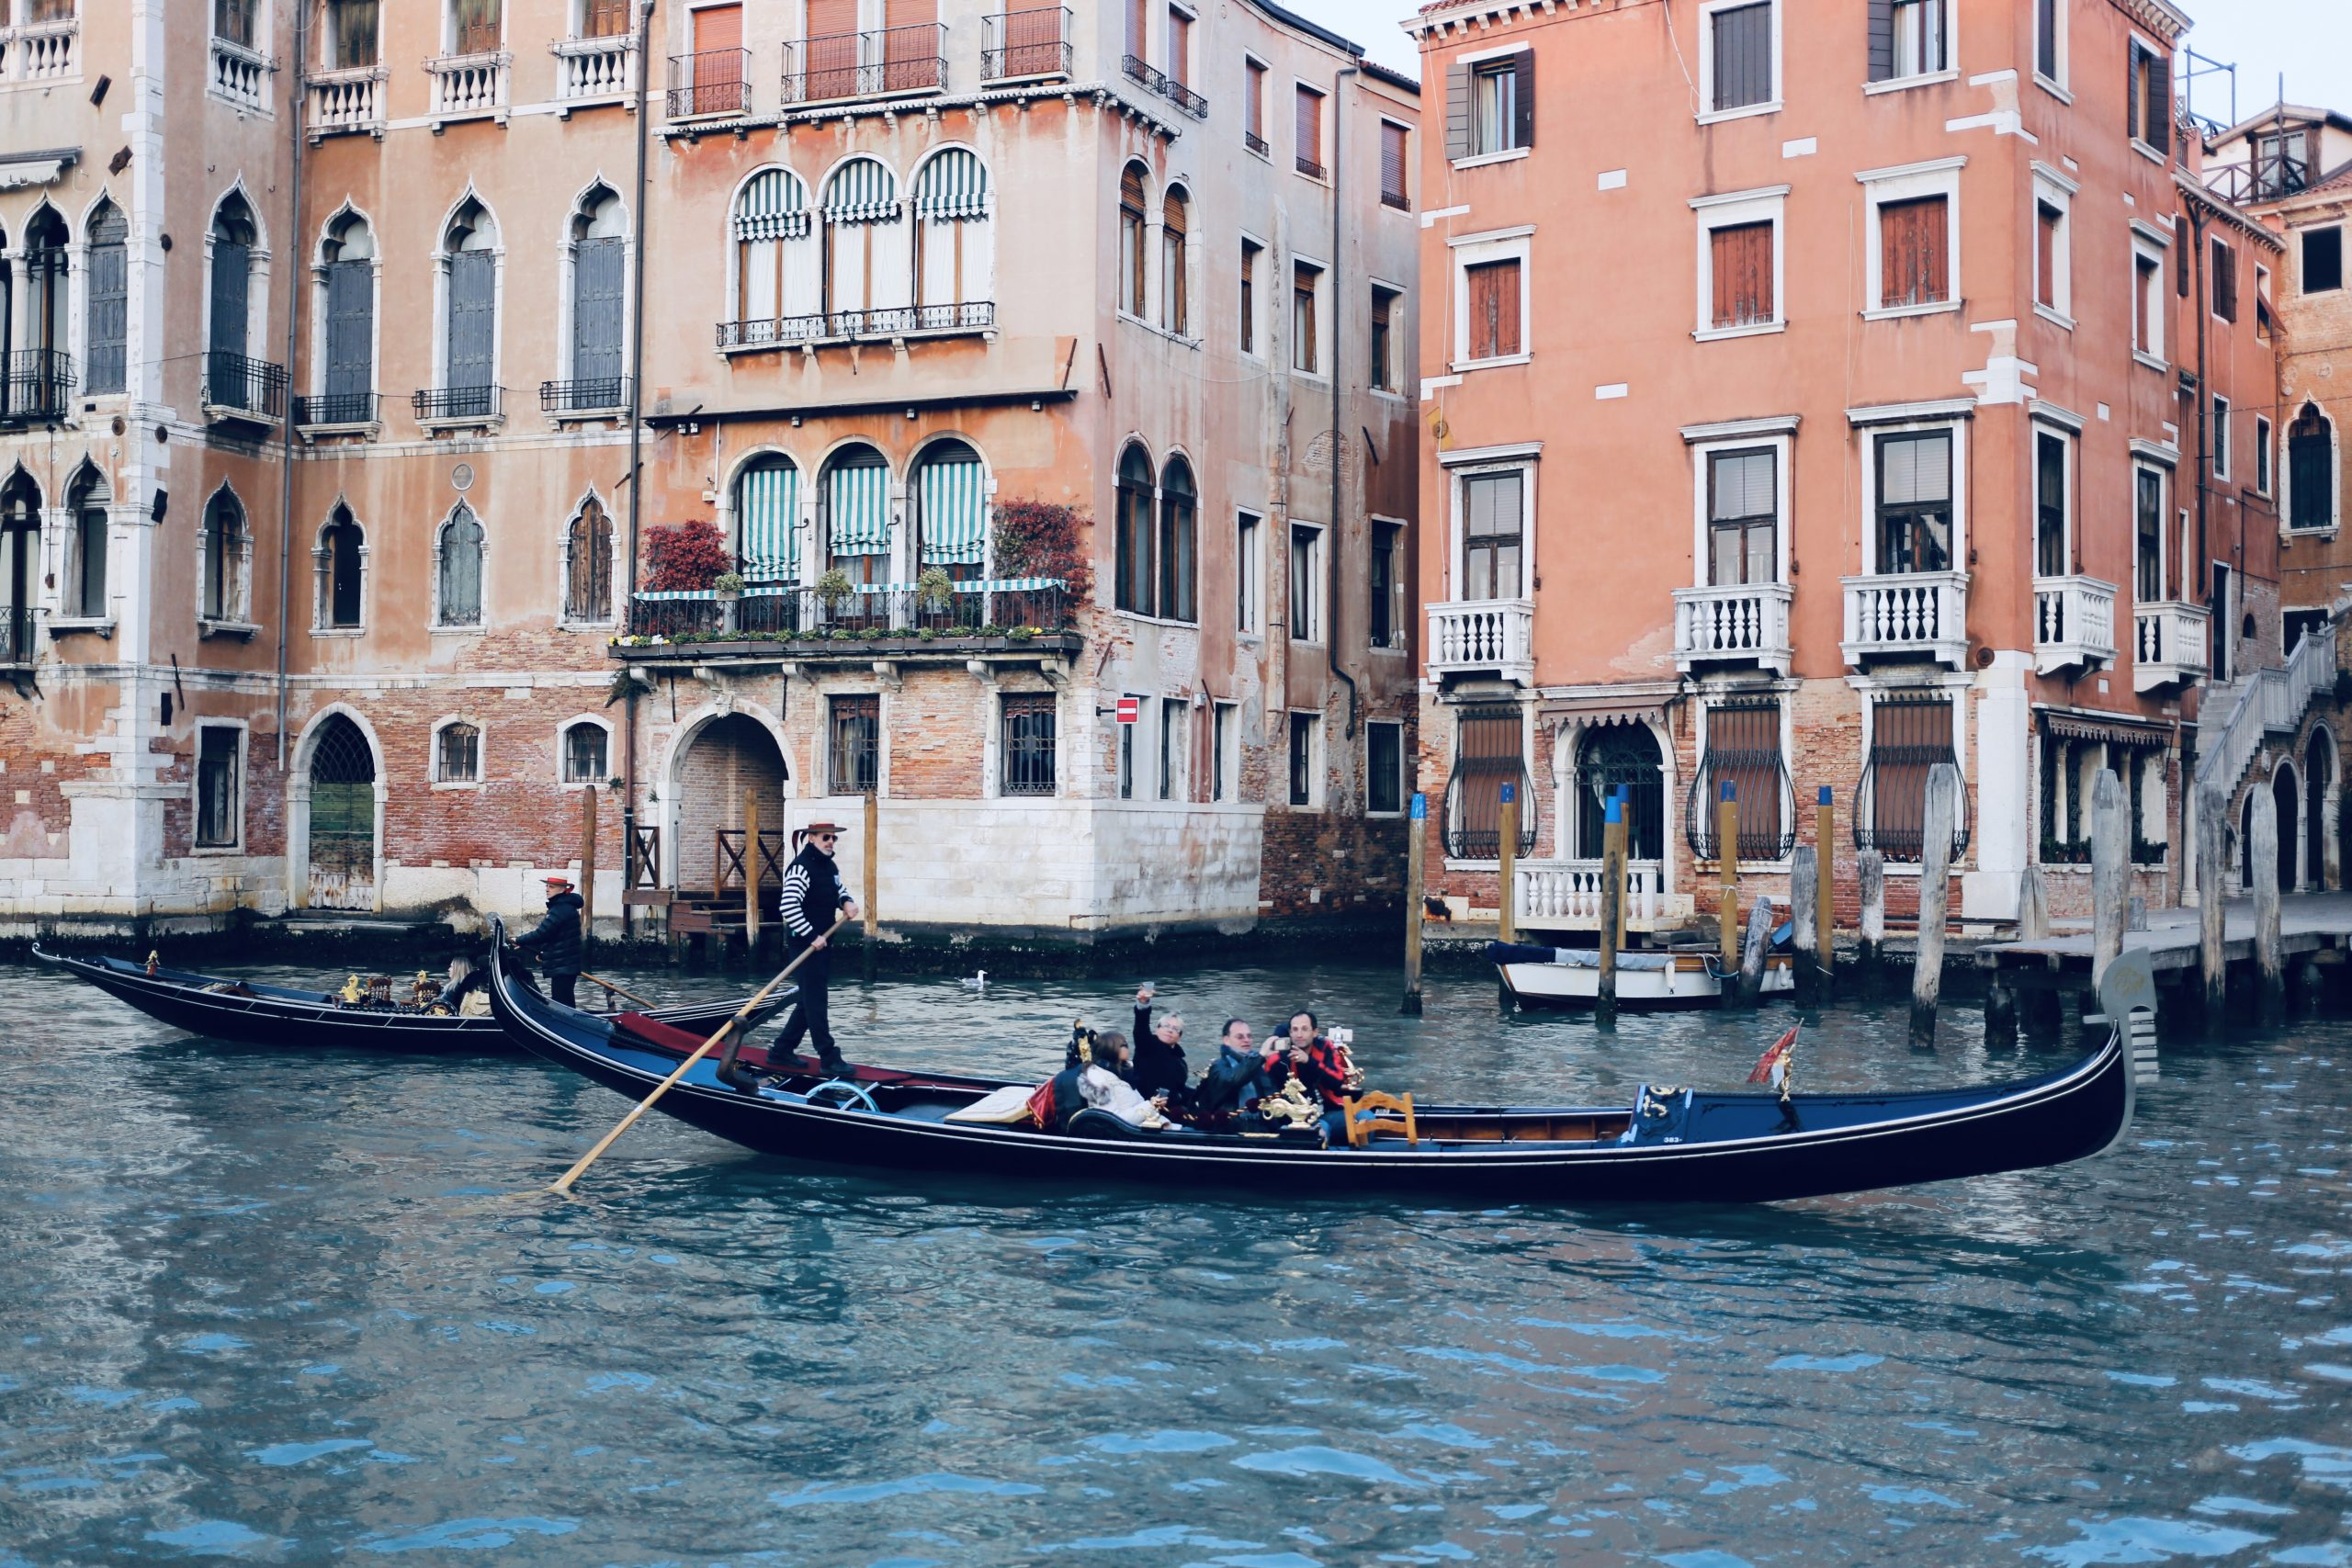 TravelMagazine.org: Venice